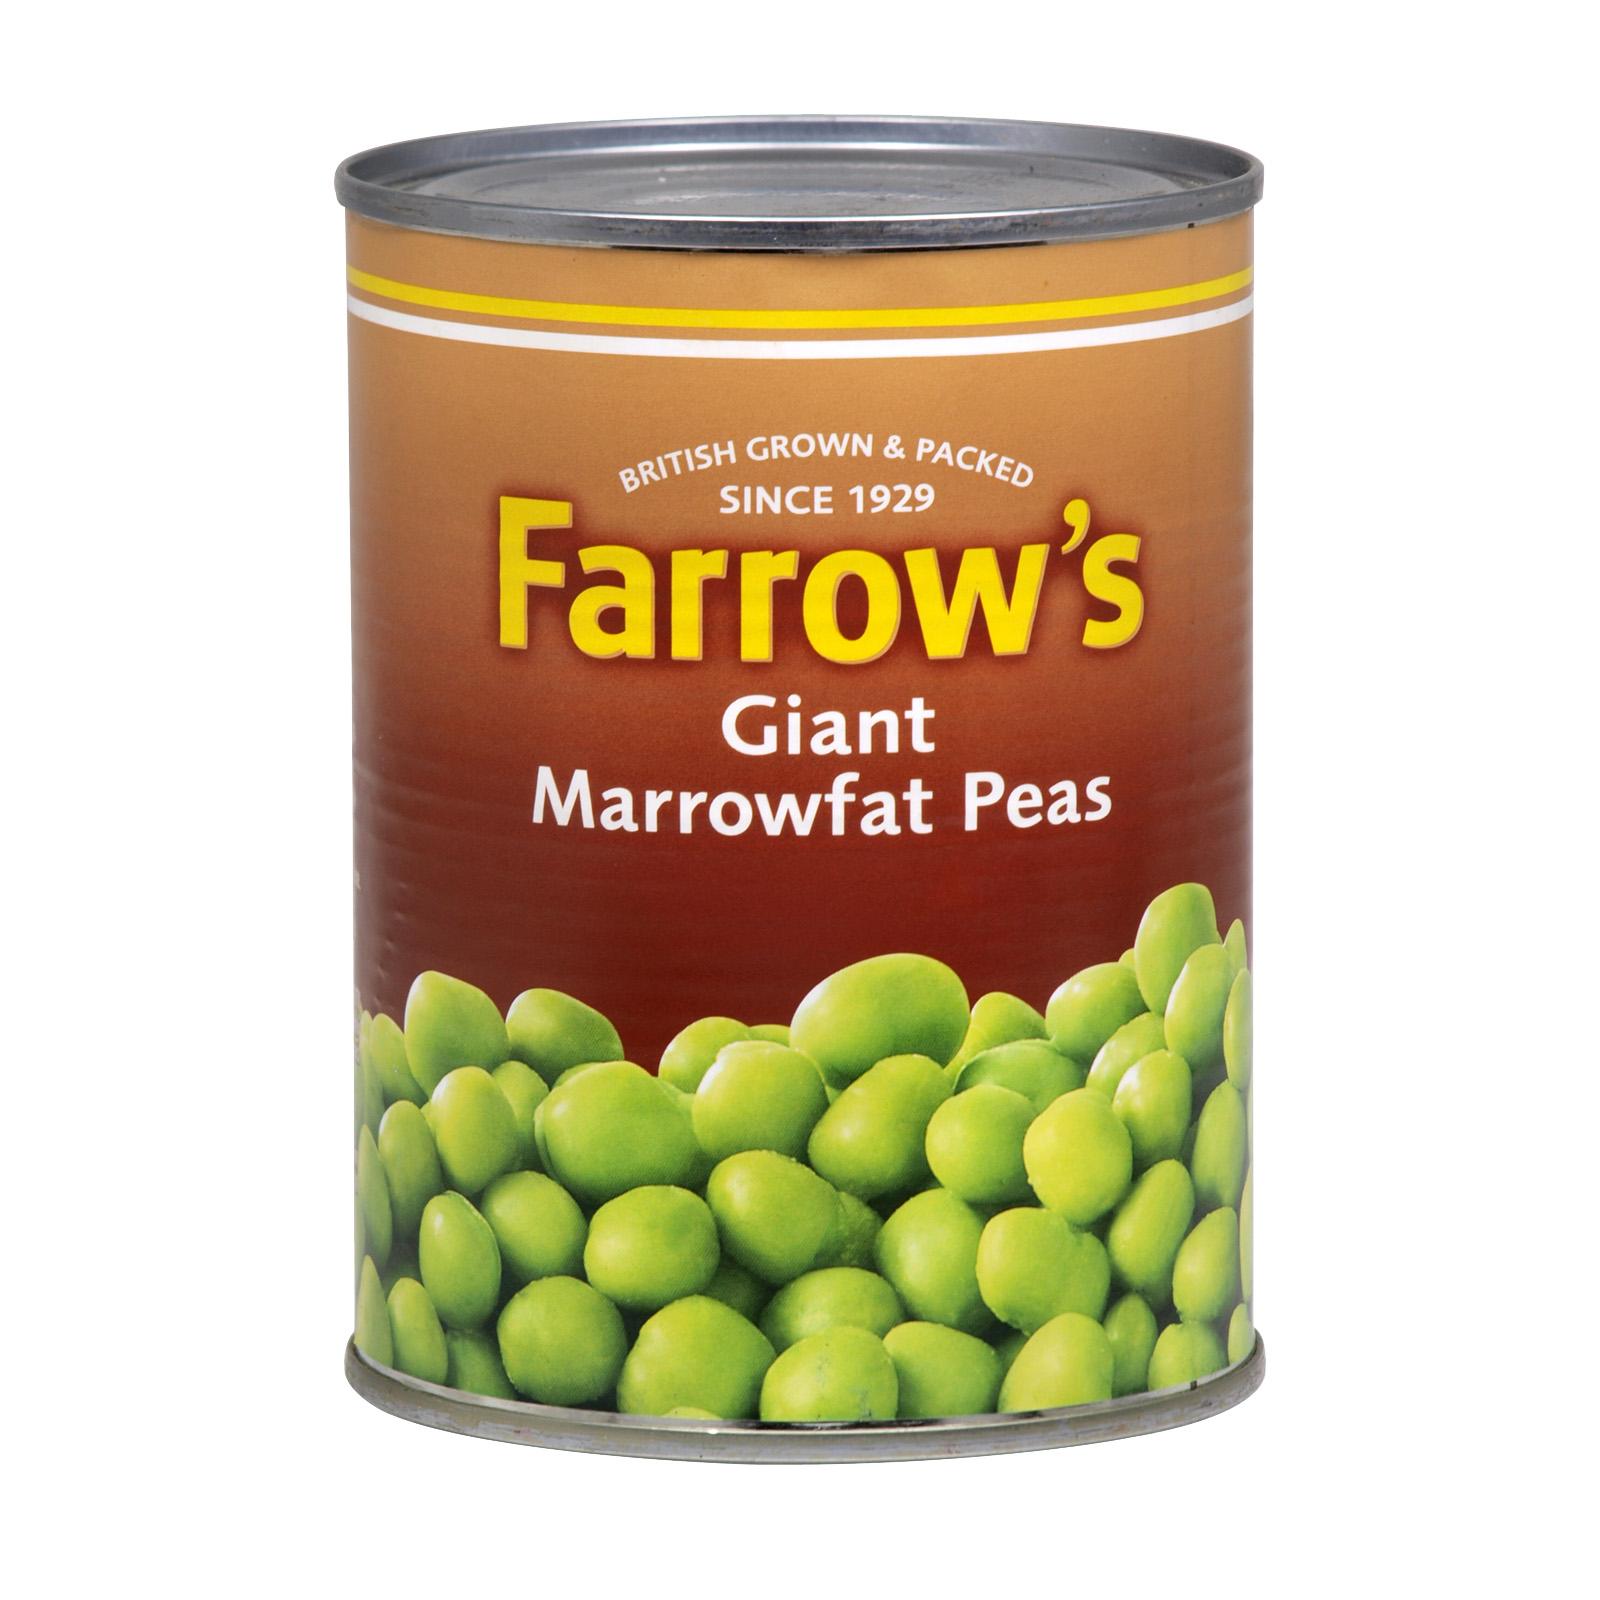 FARROWS GIANT MARROWFAT PEAS 538GM